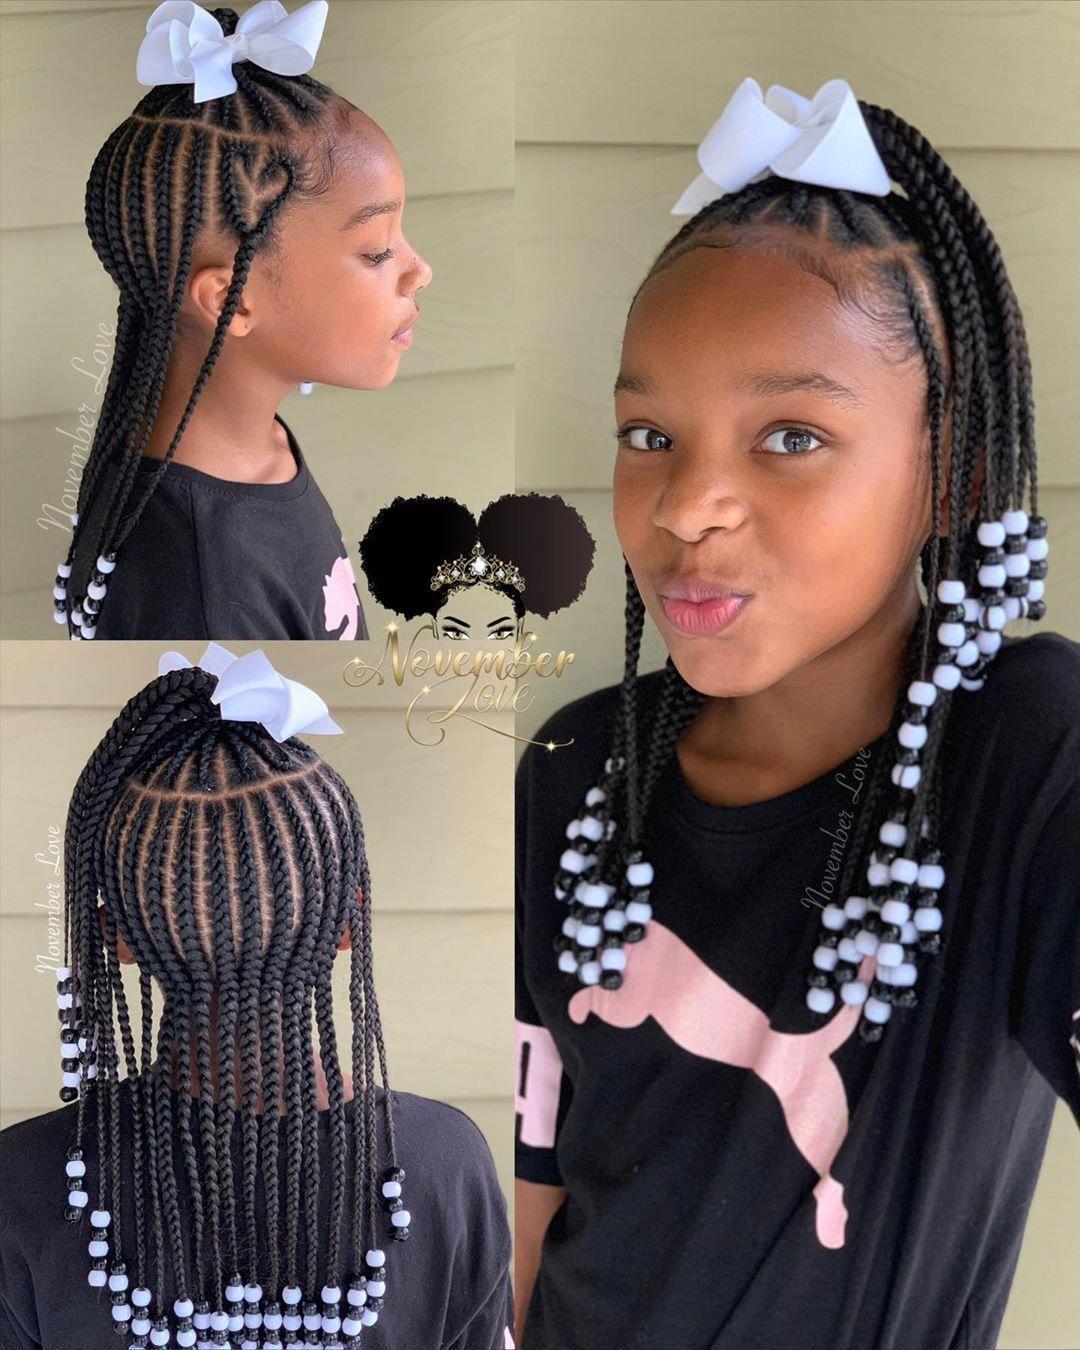 Braided Ponytail Hairstyles Kid Braid Styles Black Kids Hairstyles Lil Girl Hairstyles